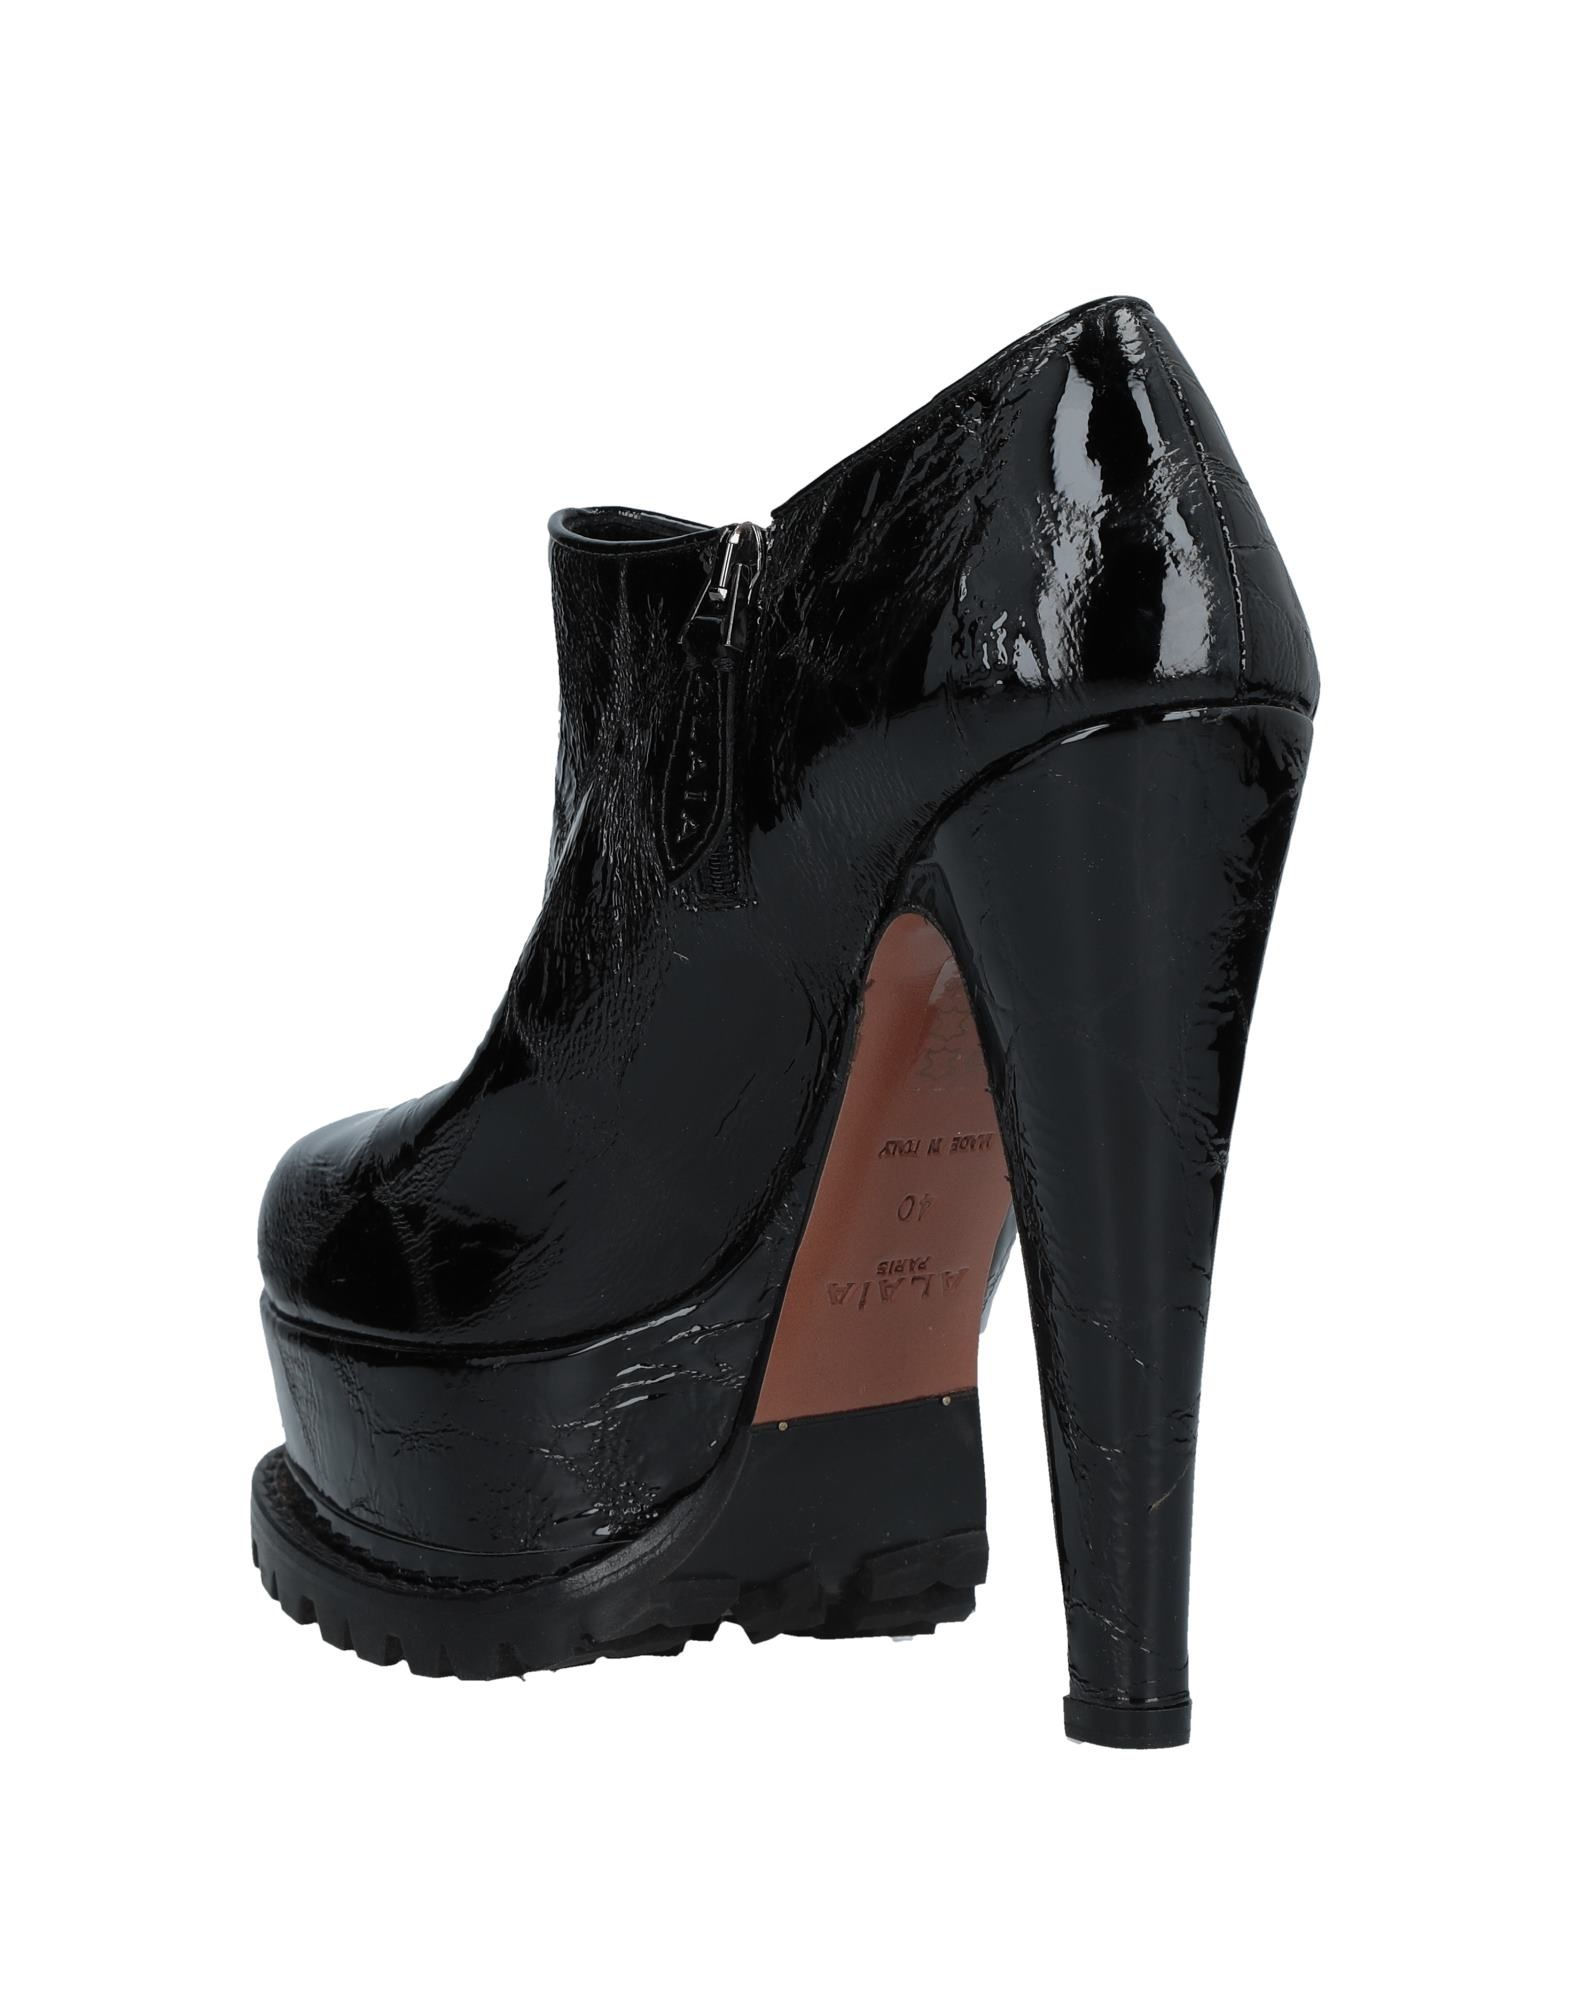 Alaïa Stiefelette Damen Schuhe  11533440RTGünstige gut aussehende Schuhe Damen c04e78